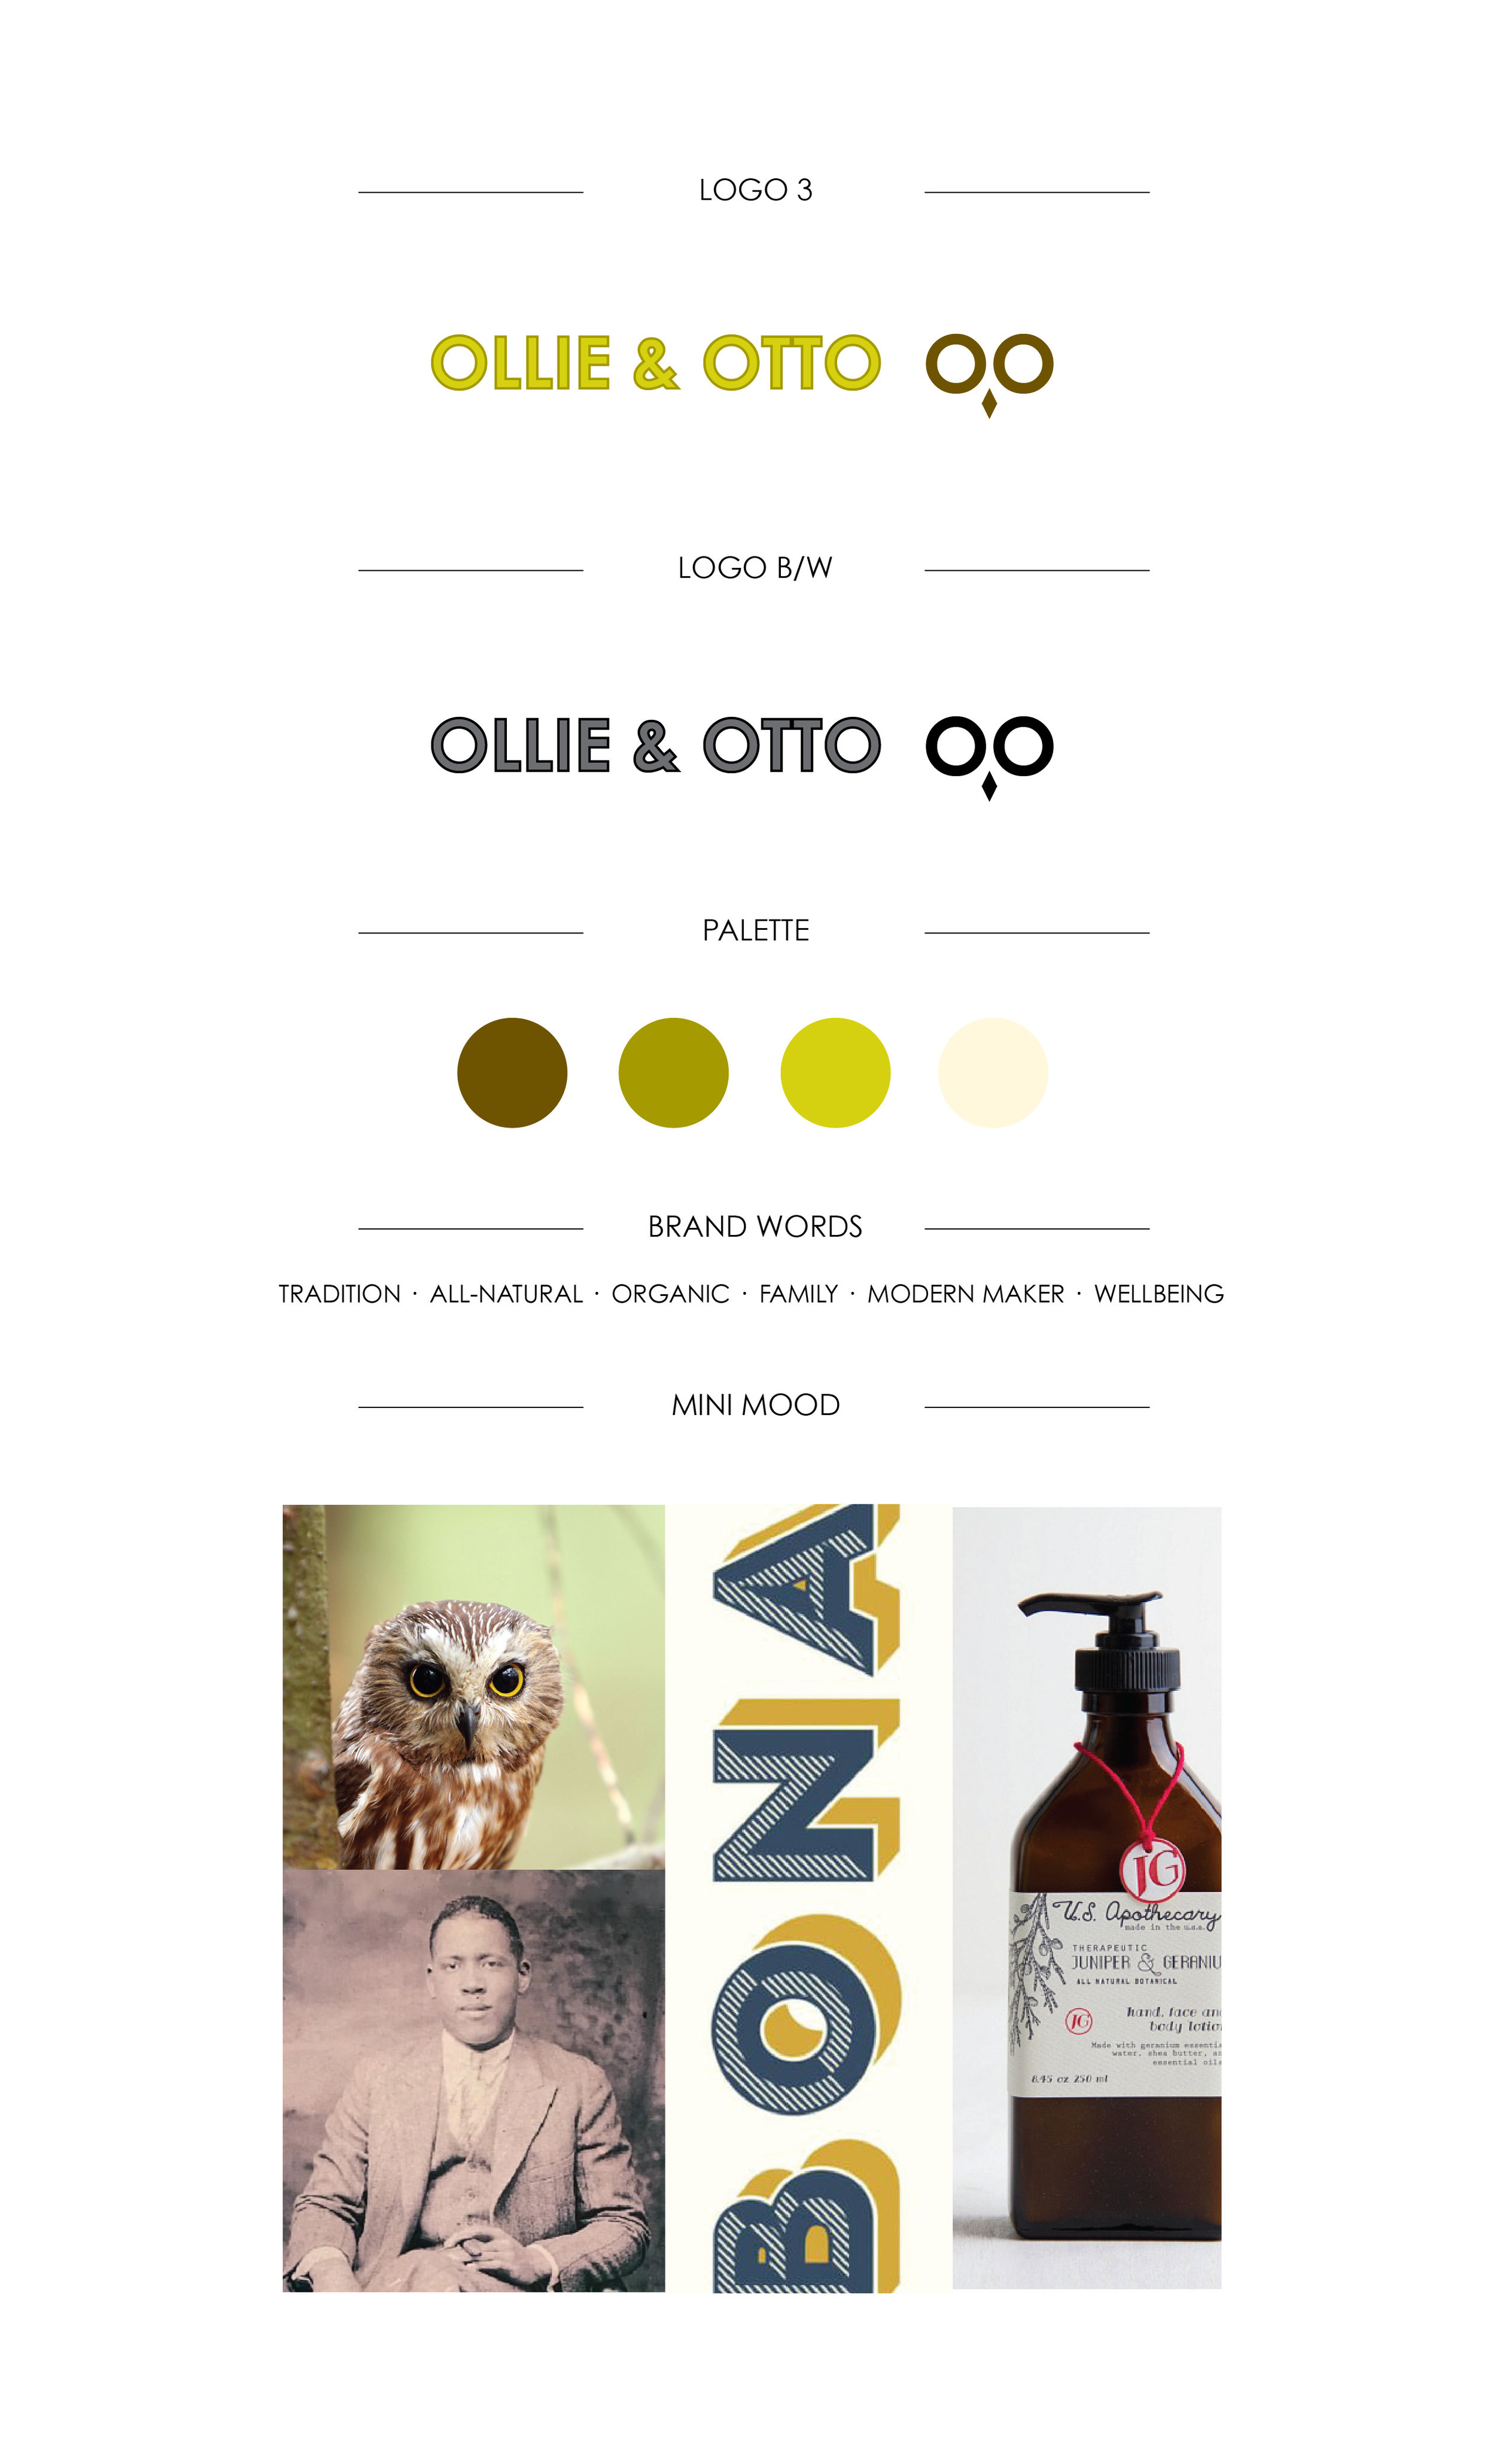 ollieandotto_logo-03.jpg